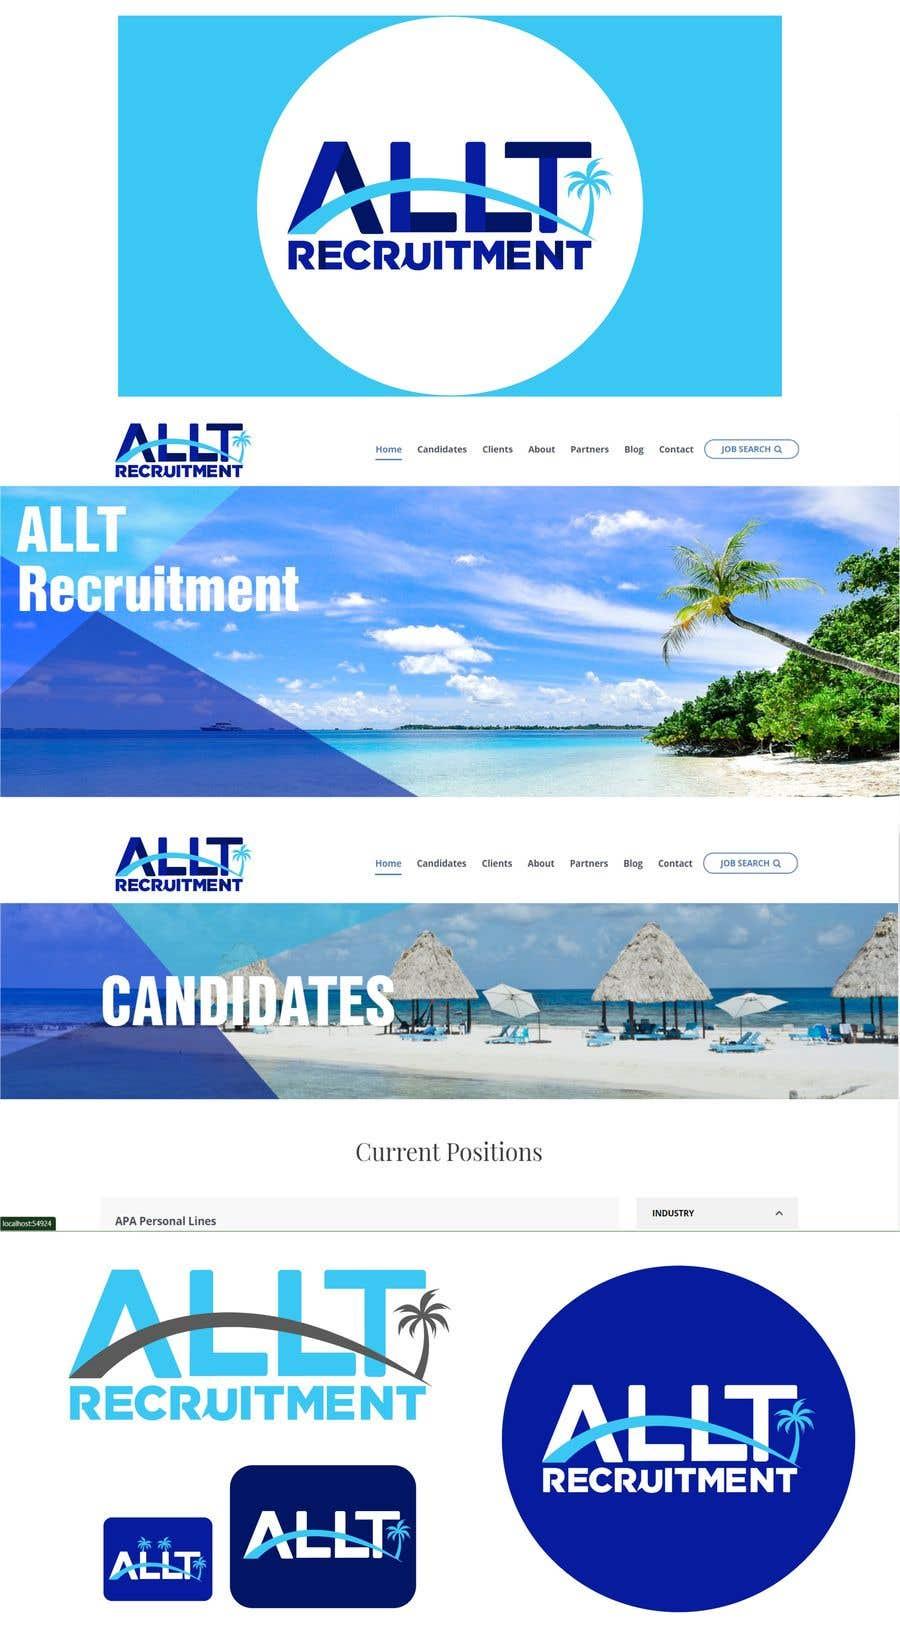 Penyertaan Peraduan #                                        221                                      untuk                                         Logo Design for Recruitment Website